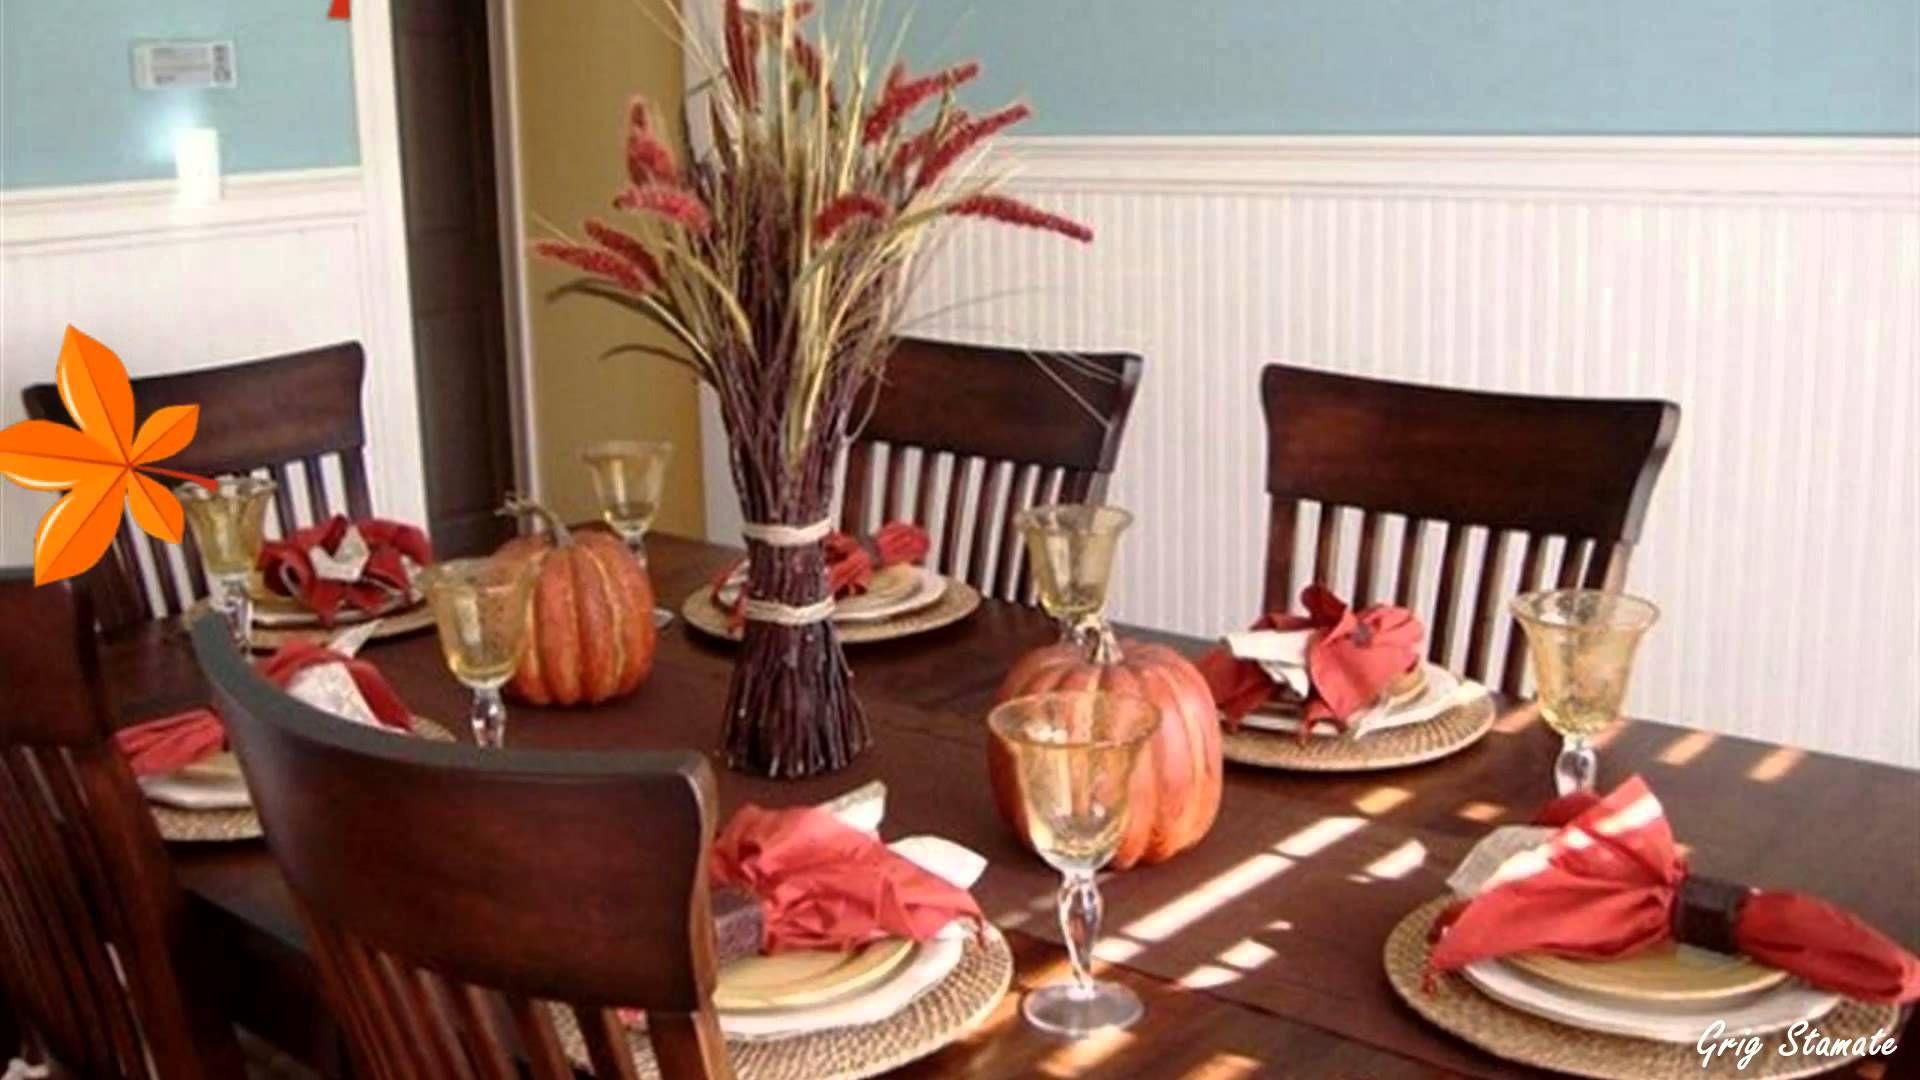 Autumn Table Setting Ideas Fall Decorations Youtube. home decor liquidators. vintage home decor. pinterest home decor ideas. home office decor.